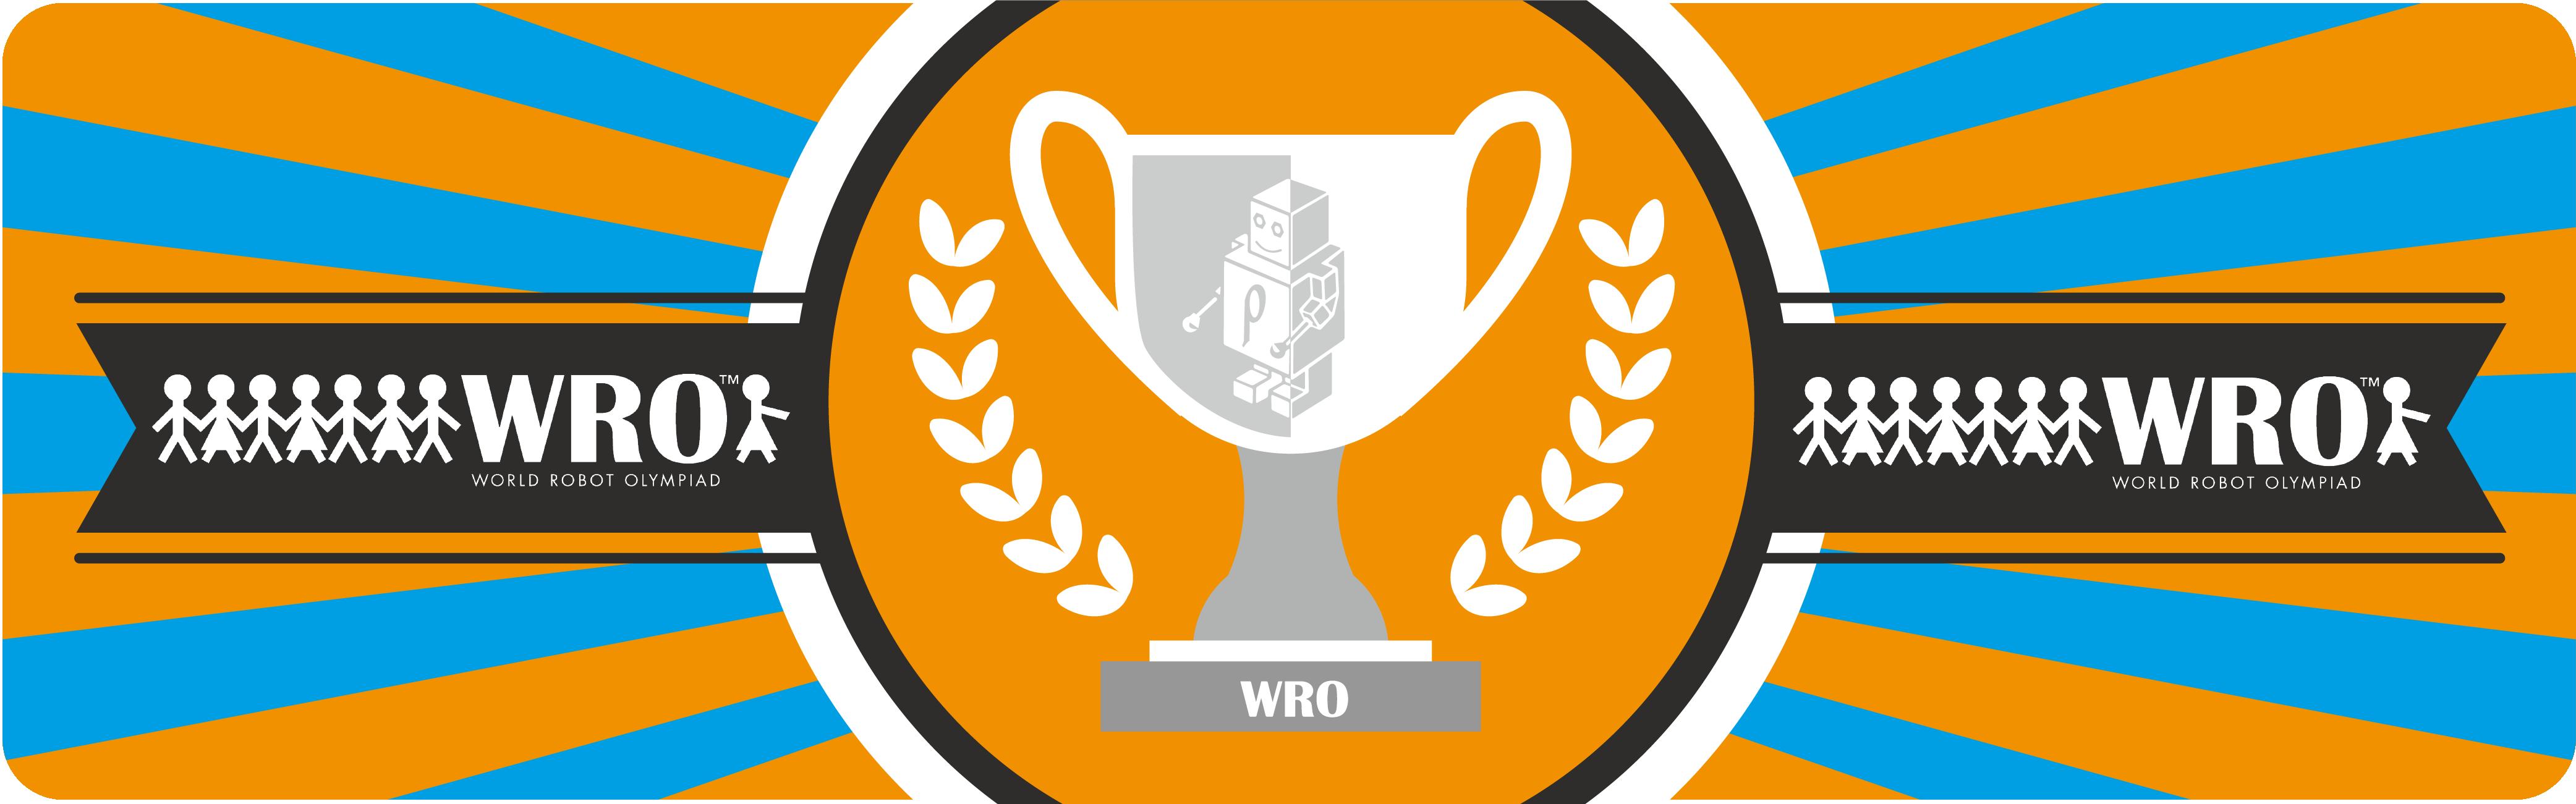 WRO 2017